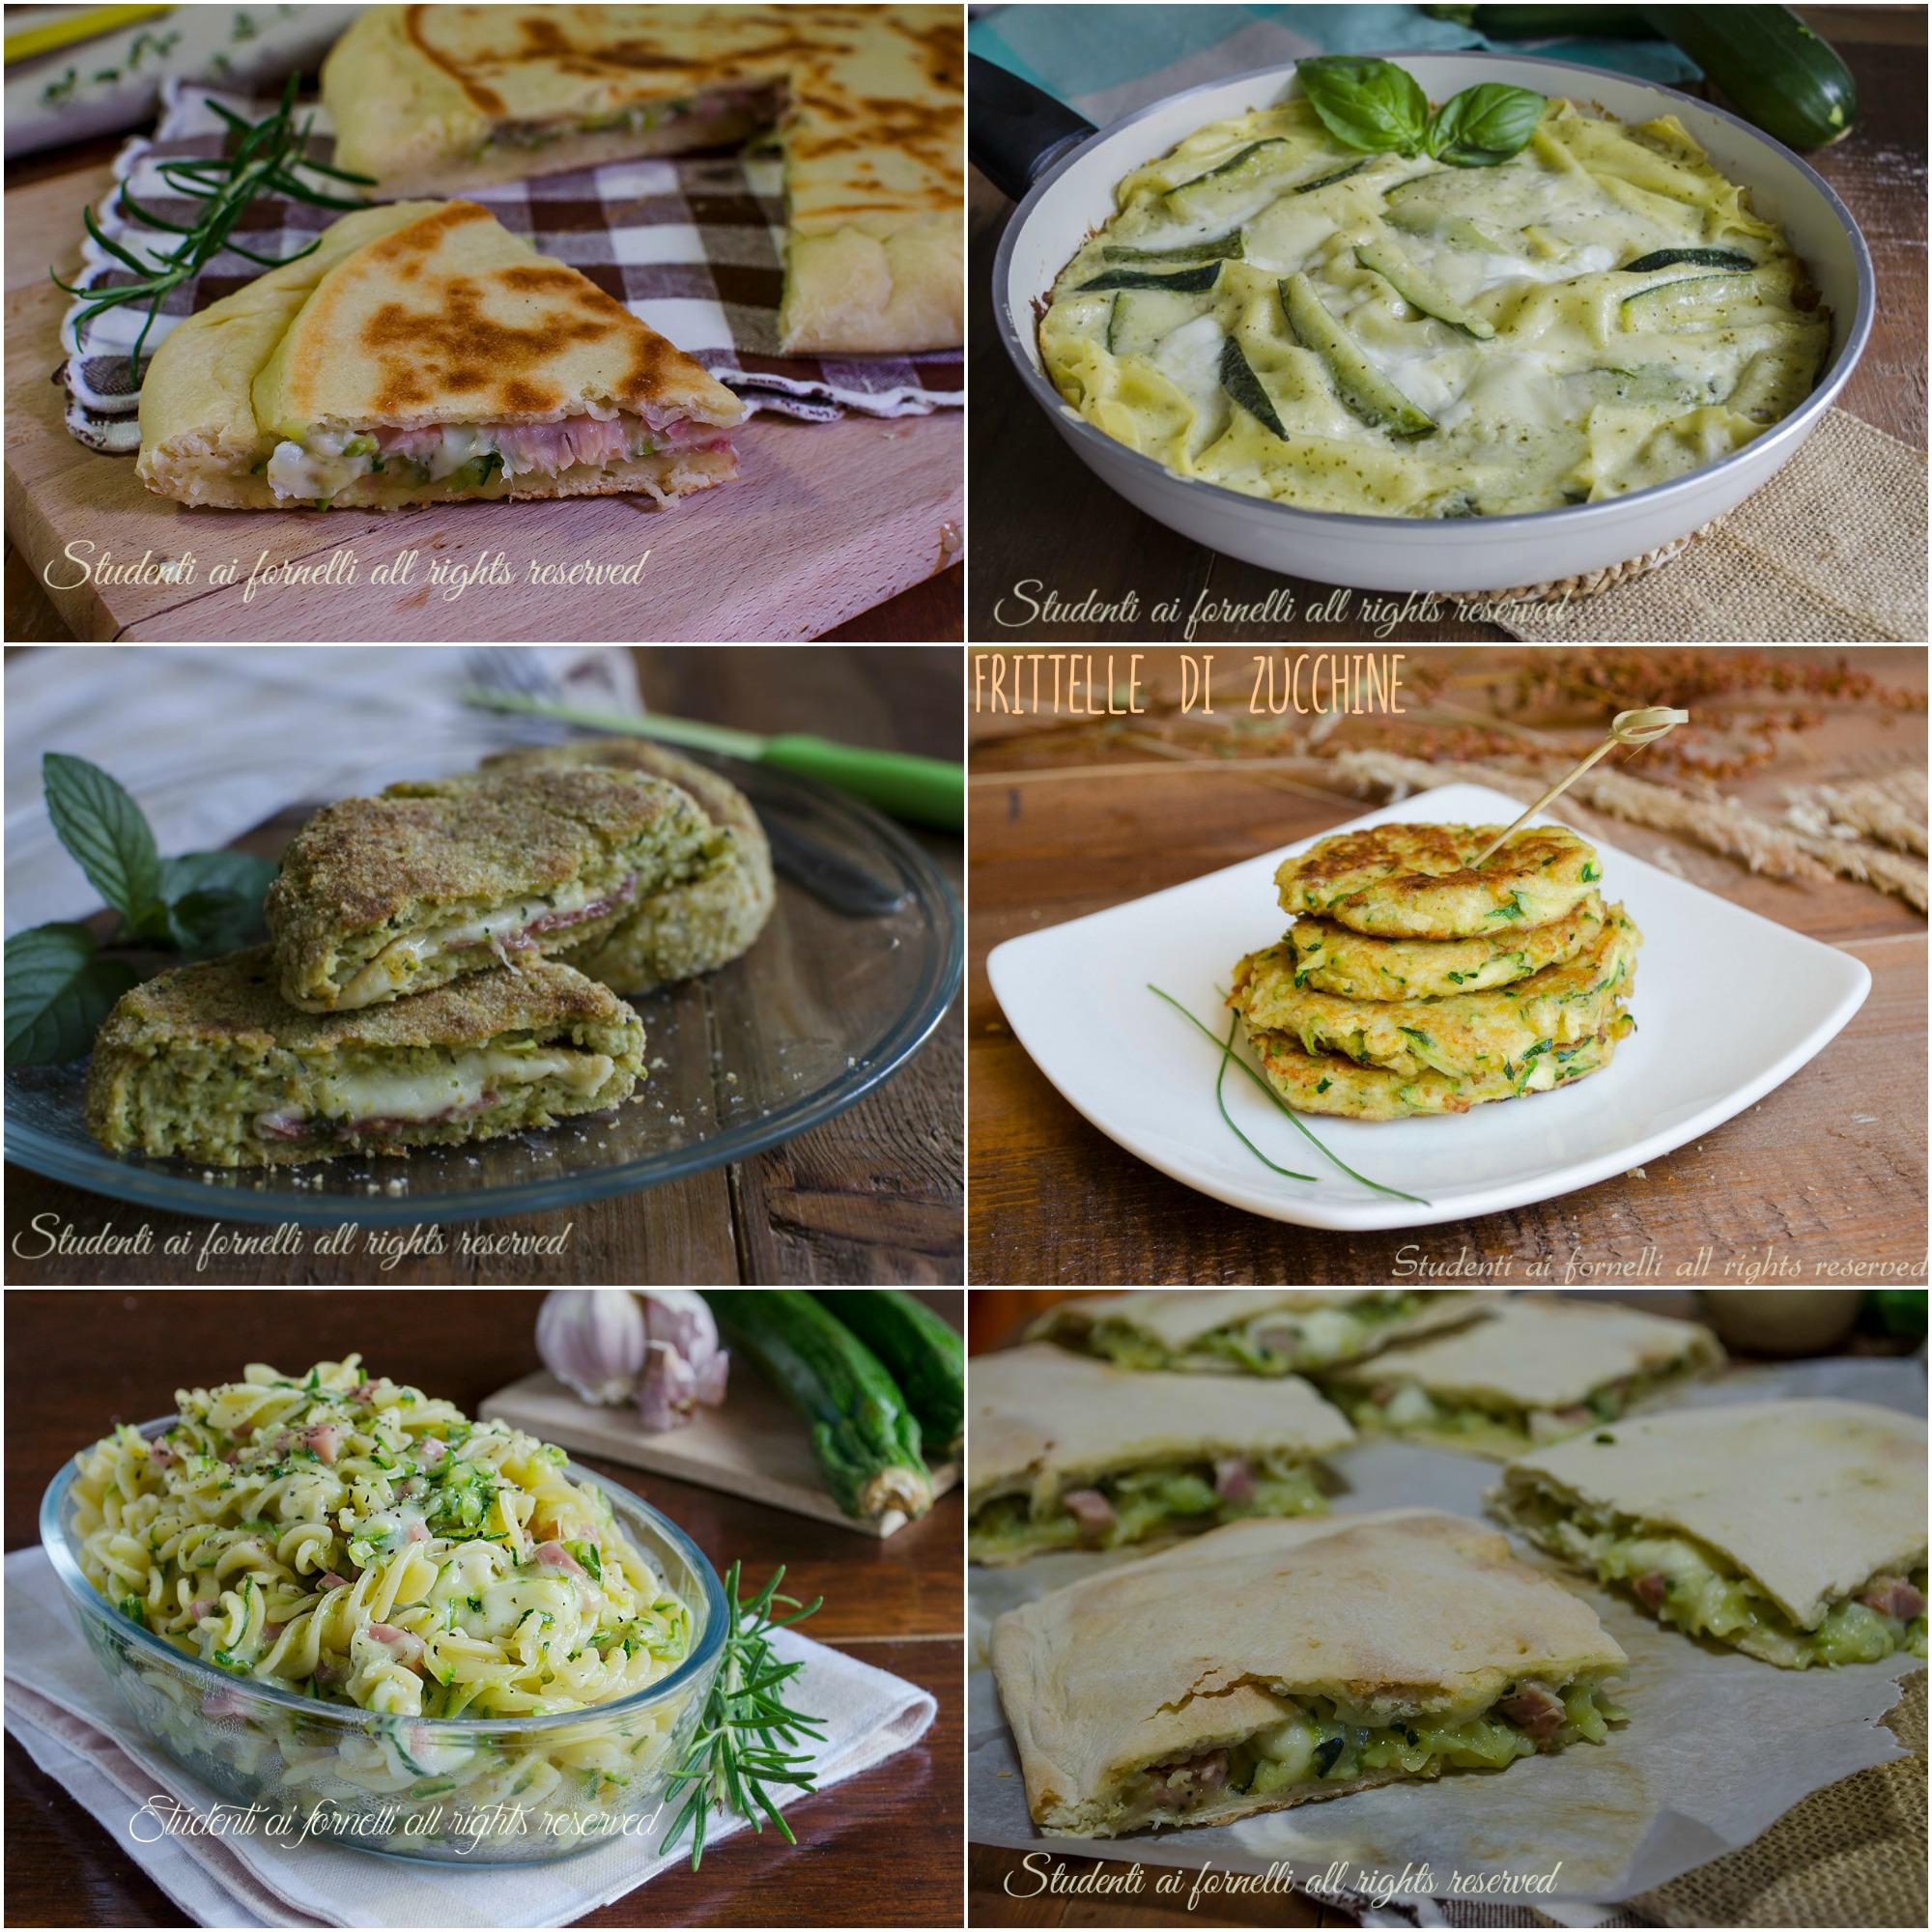 Ricette Contorni alle Zucchine - Cucchiaio d'Argento